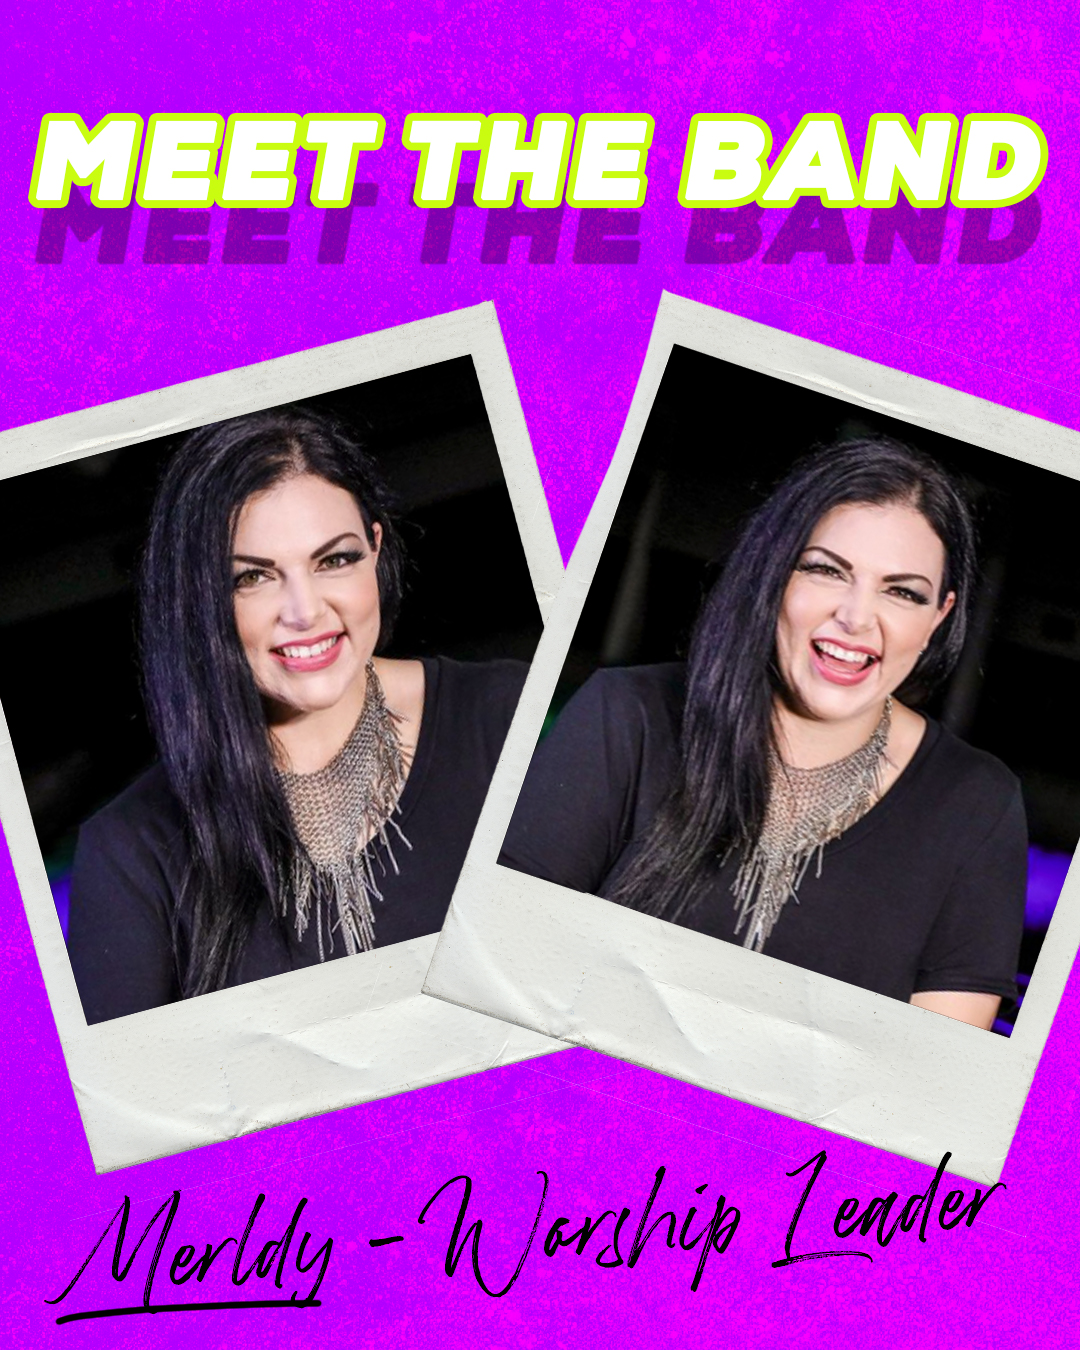 Meet the Band: Merldy